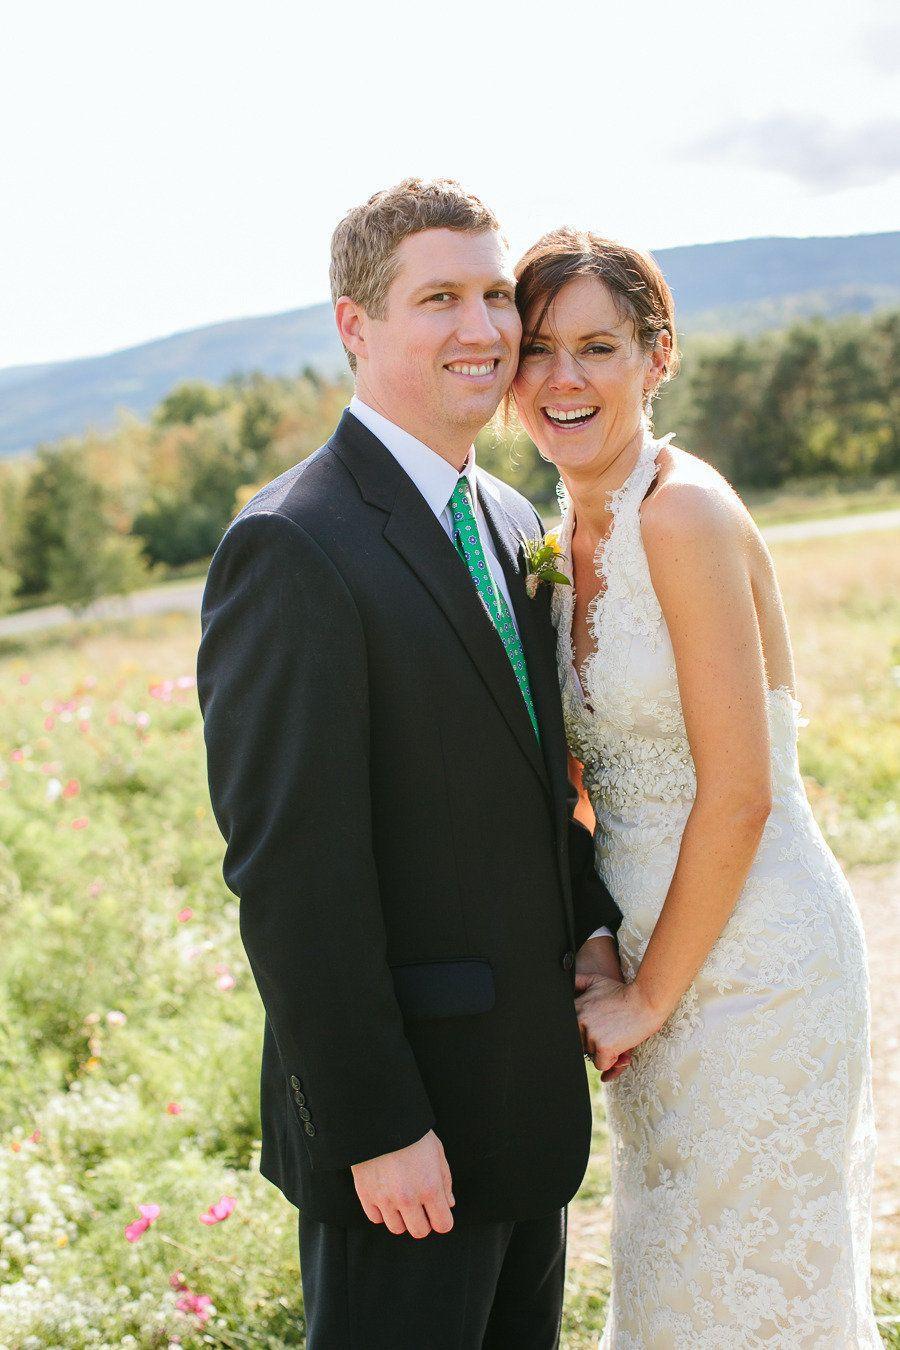 Canandaigua lake new york wedding from tory williams photography